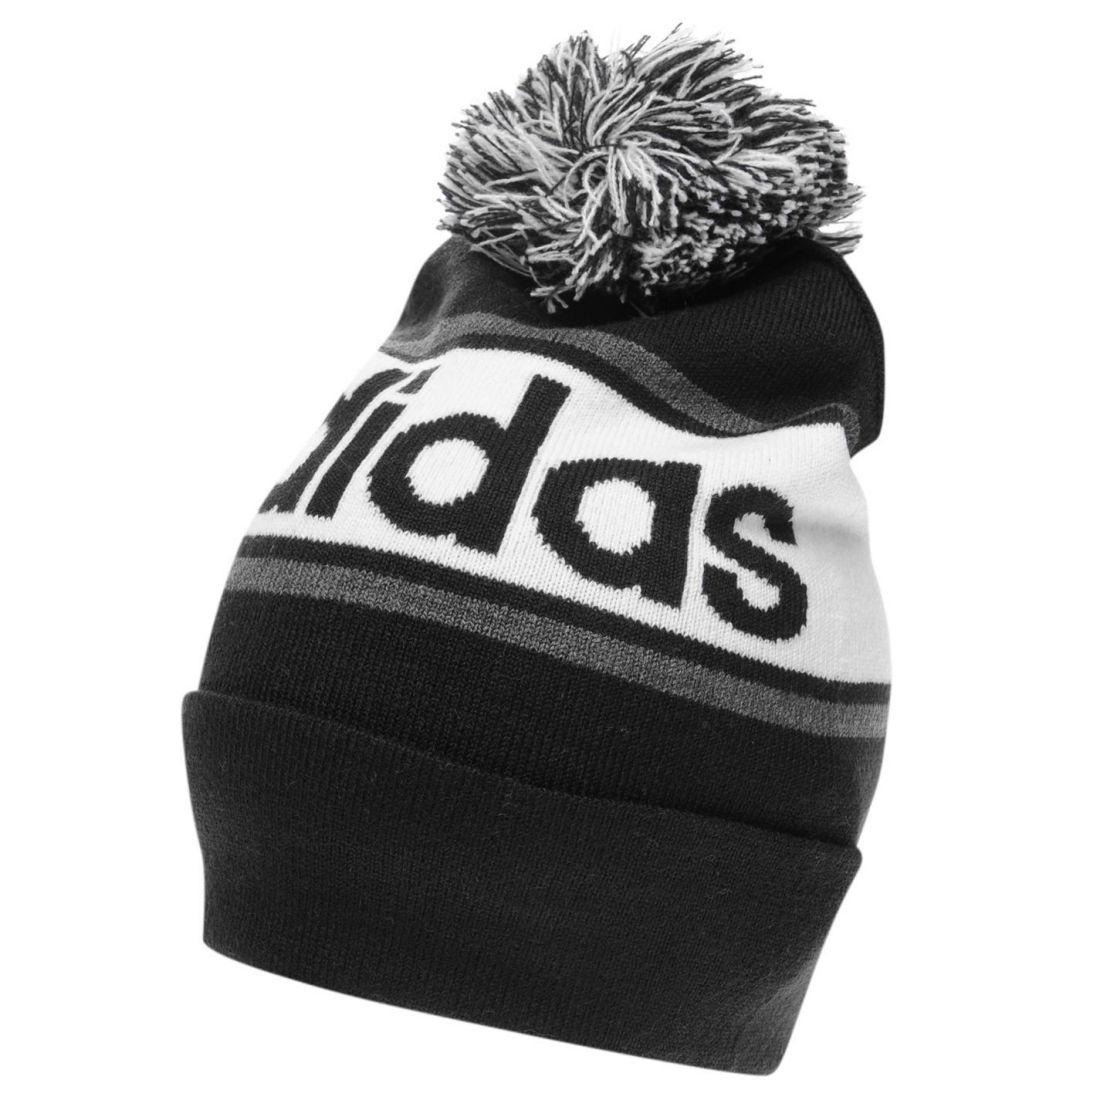 adidas Mens Linear Woolie Hat Beanie Pattern Stripe Winter Warm ... a4b9a4d99eff